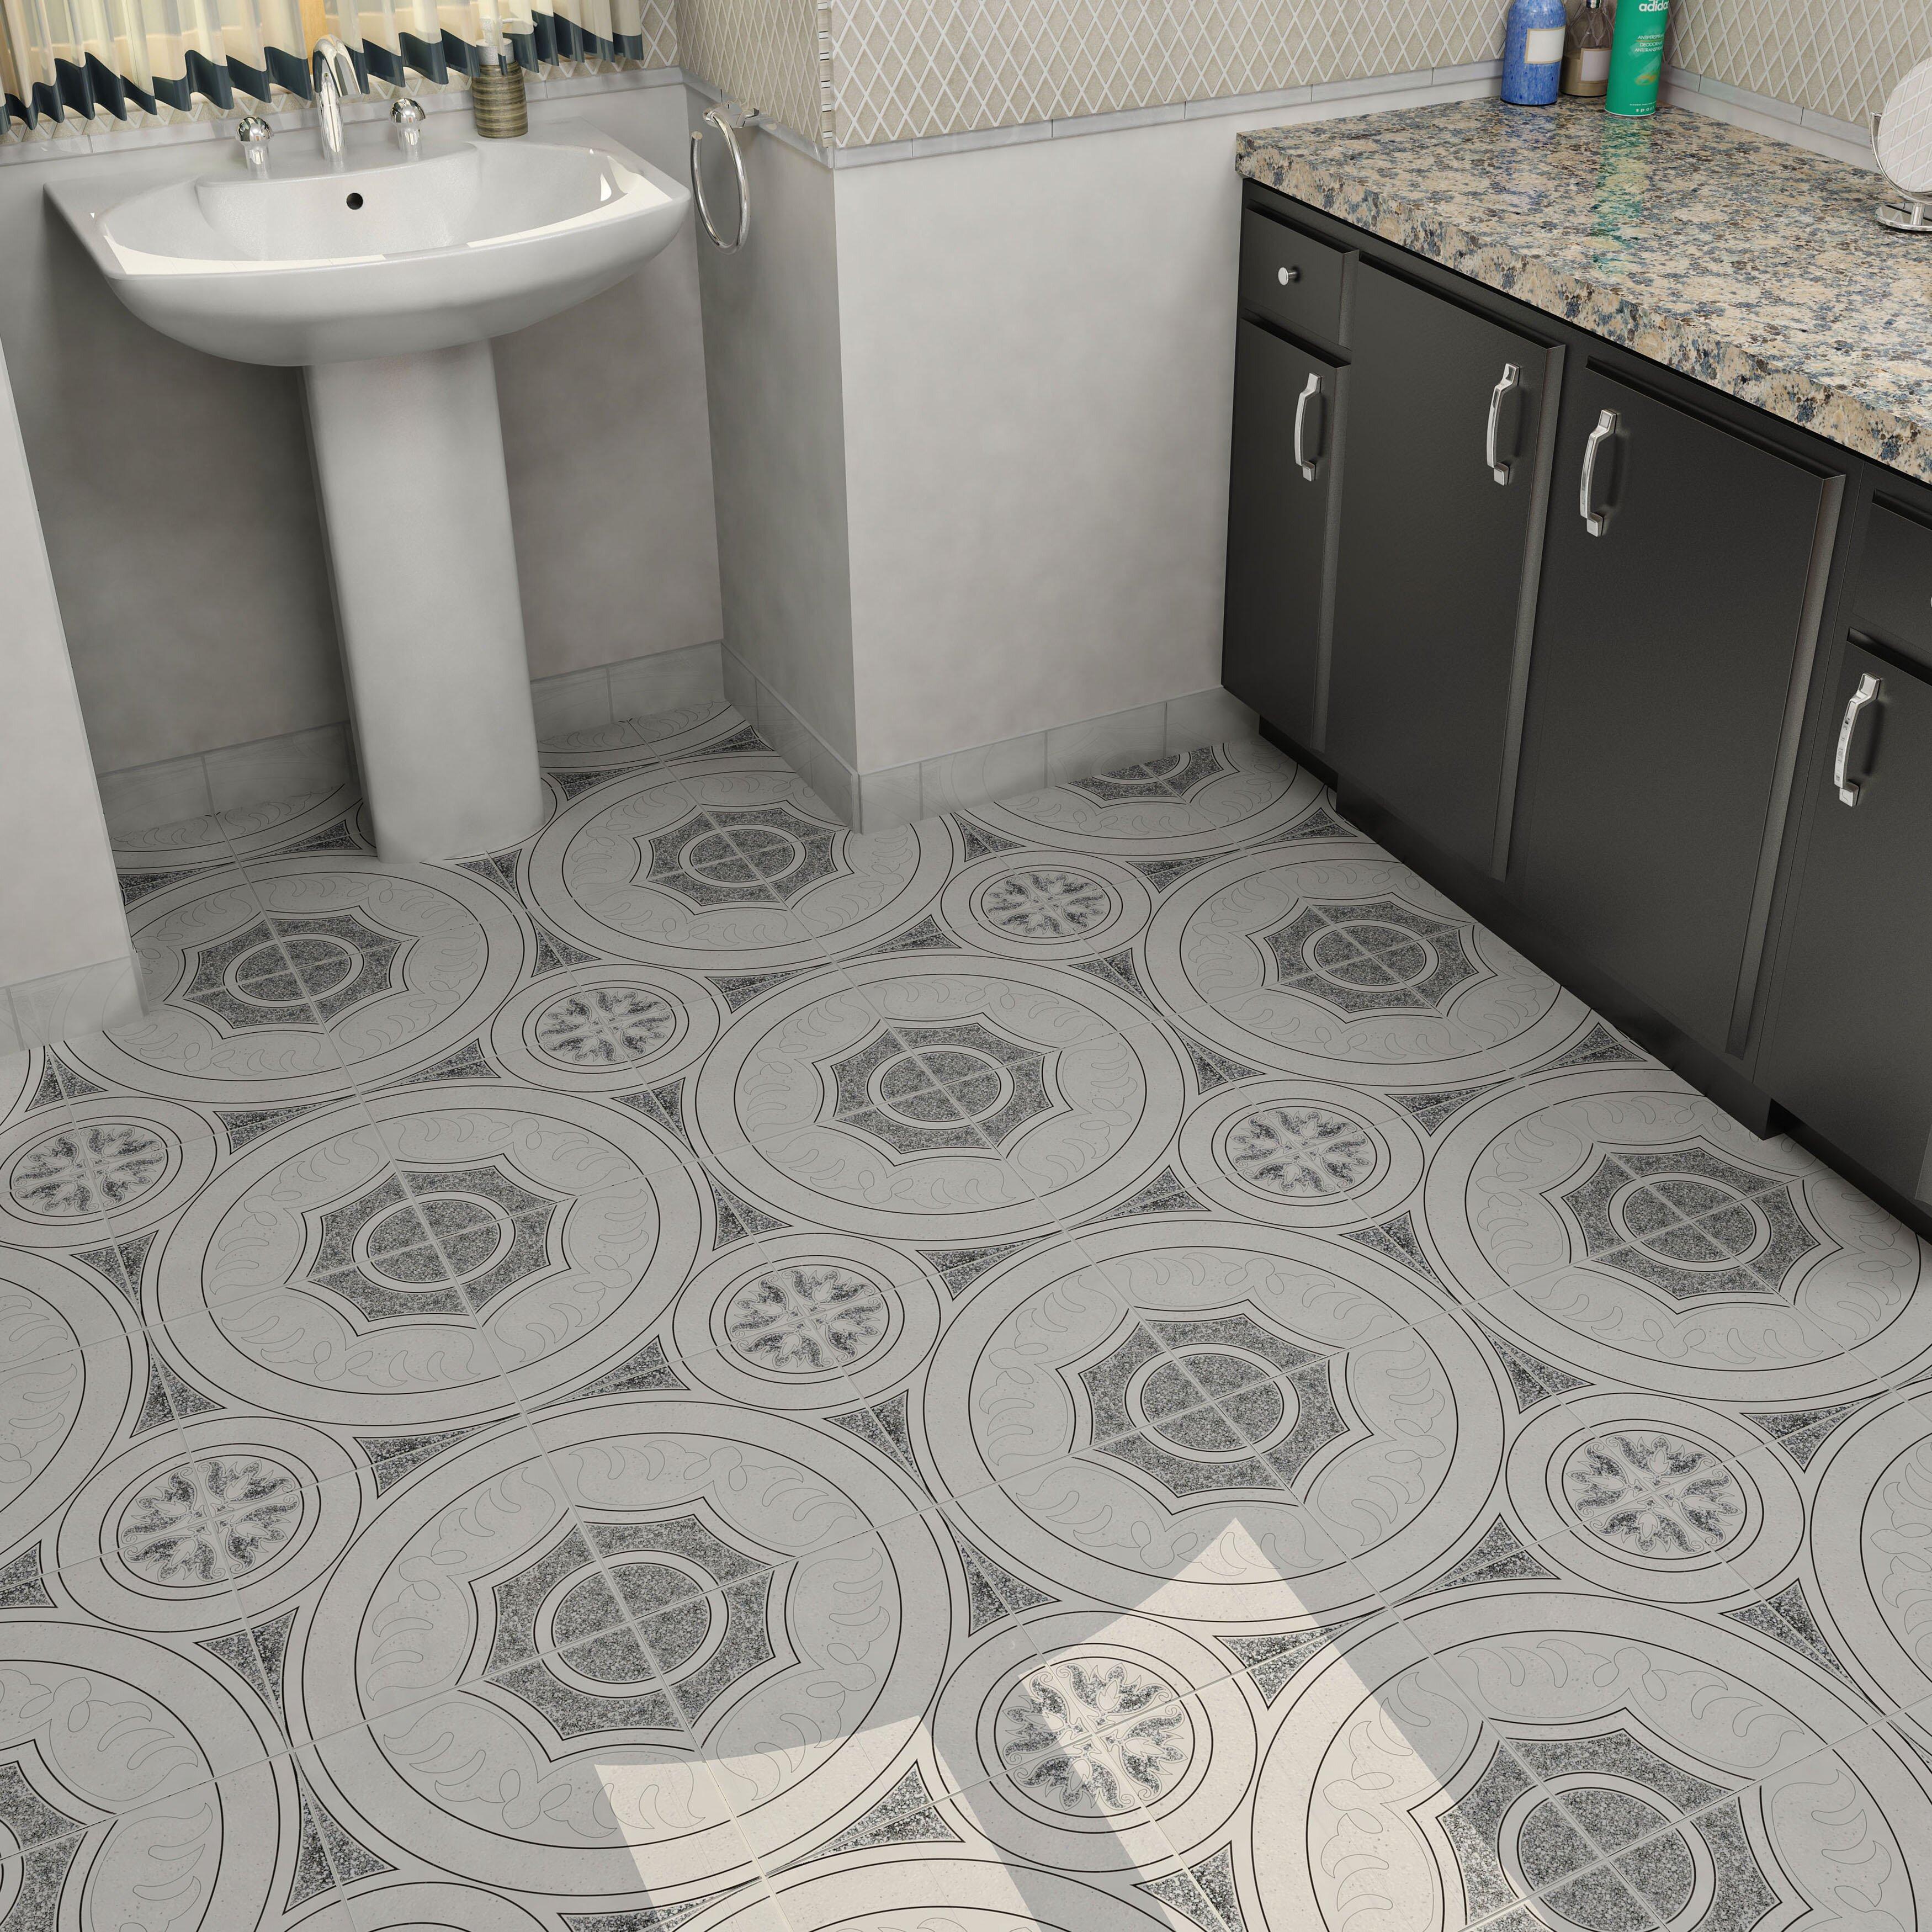 Elitetile massa 12 5 x 12 5 ceramic floor and wall tile for 12 ceramic floor tile